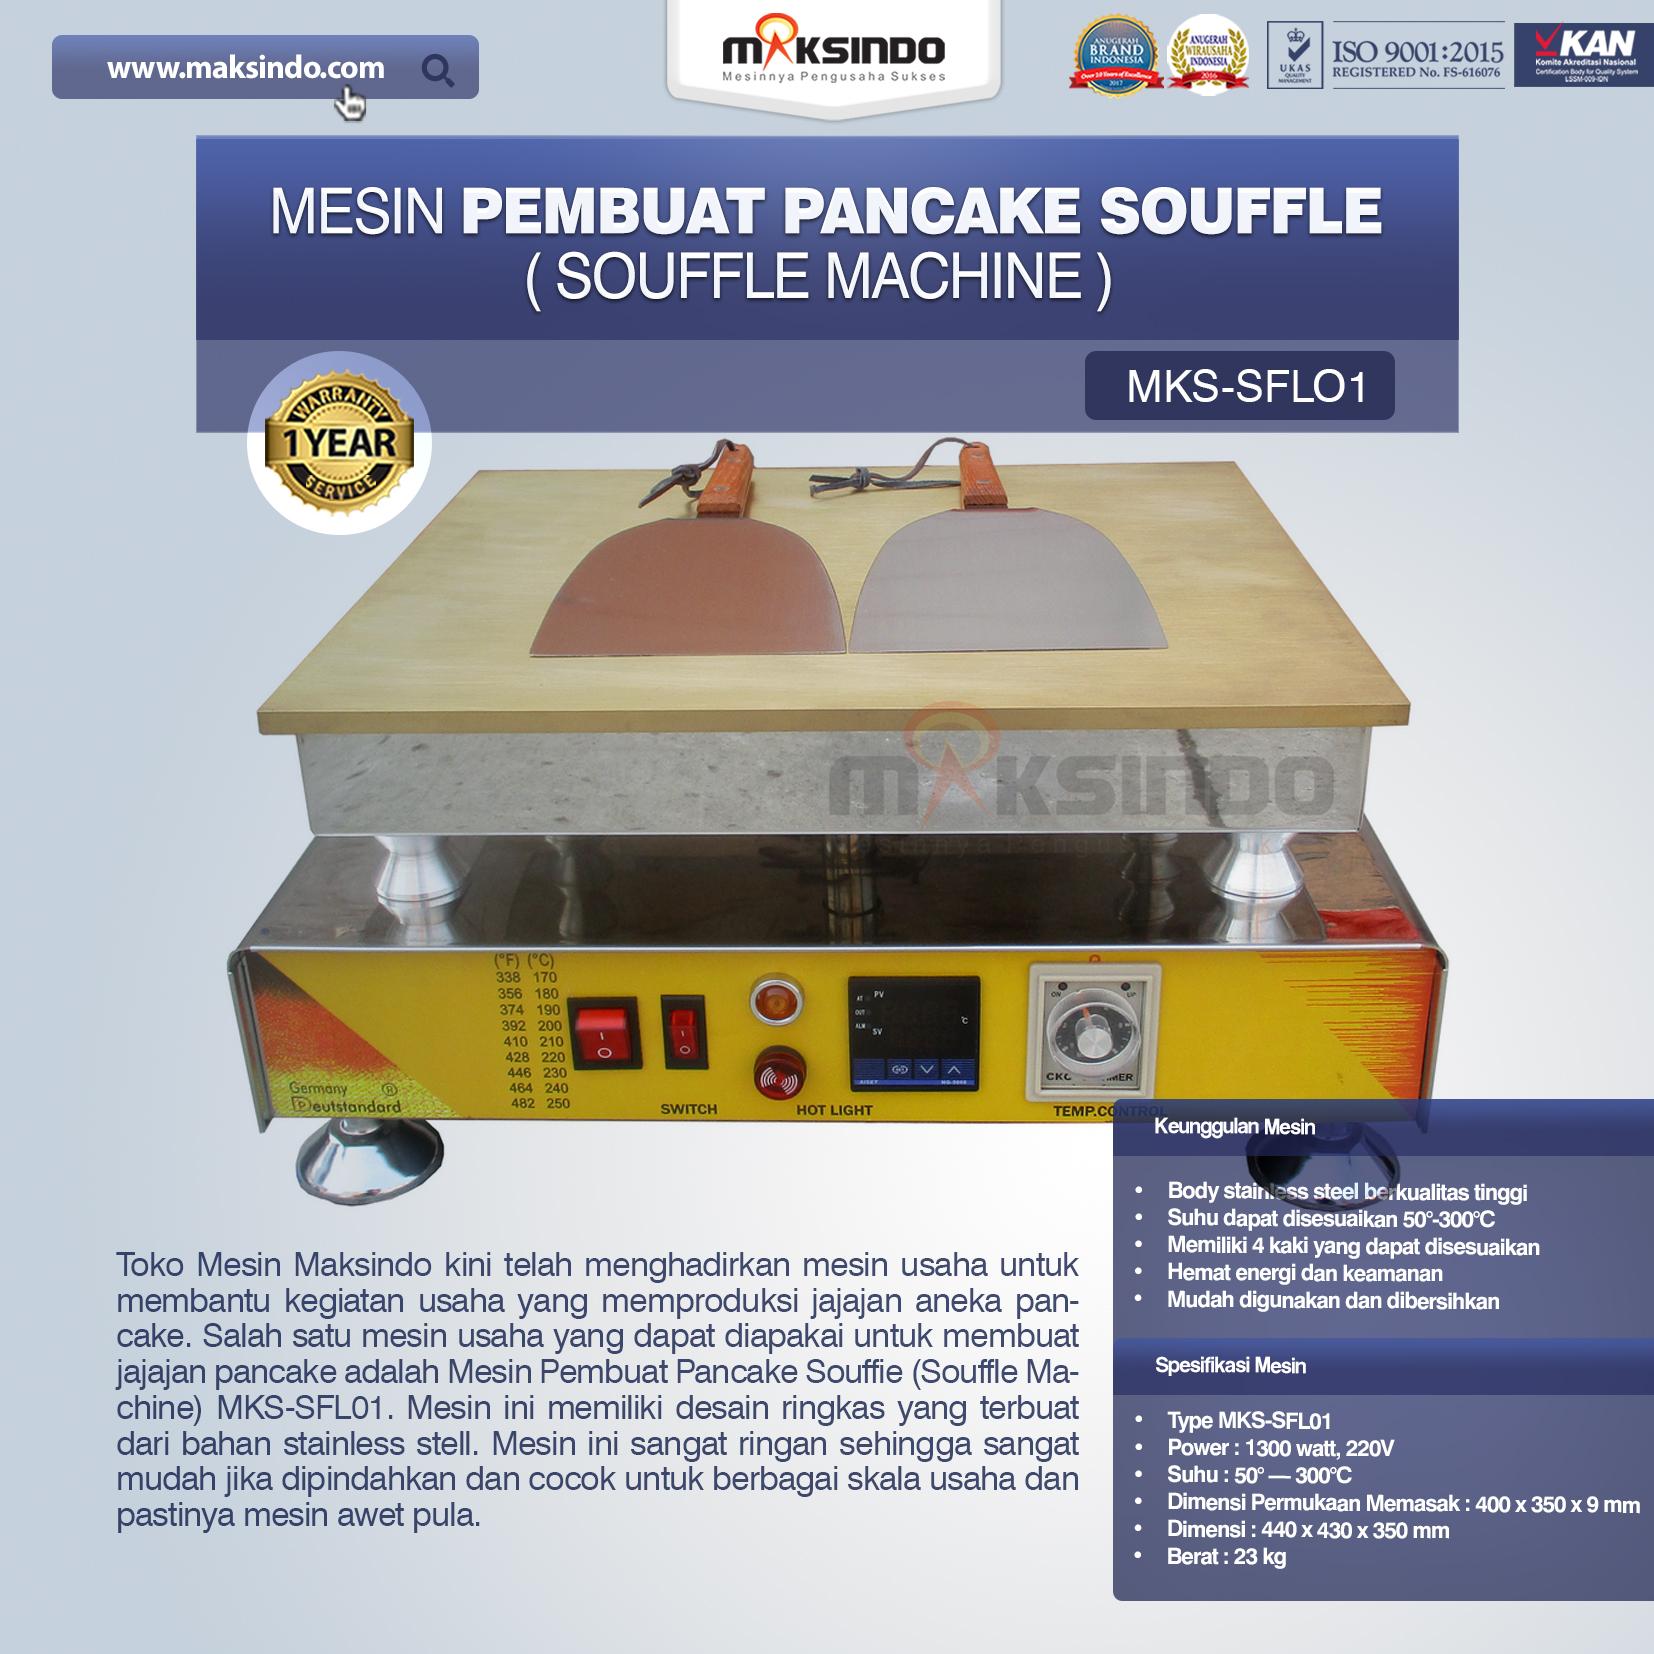 Jual Mesin Pembuat Pancake Souffle (Souffle Machine) MKS-SFL01 di Bandung